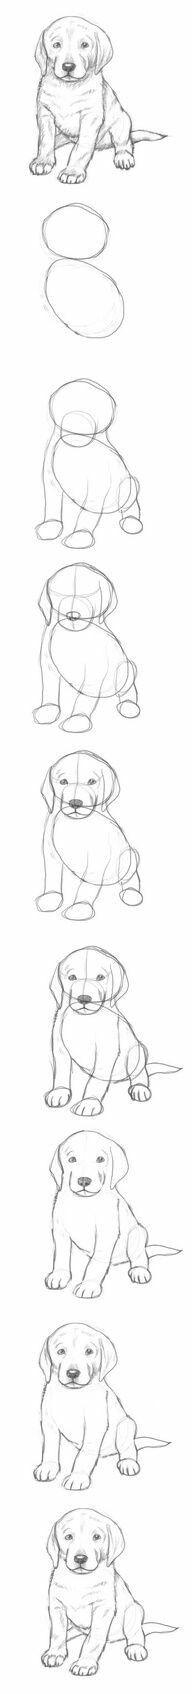 Hayvan resimleri nasıl çizilir - dibujar de dibujo para dibujar arte a lápiz de chicas Drawing Lessons, Drawing Techniques, Drawing Tips, Drawing Sketches, Art Lessons, Painting & Drawing, Baby Drawing, Sketching, Puppy Drawing